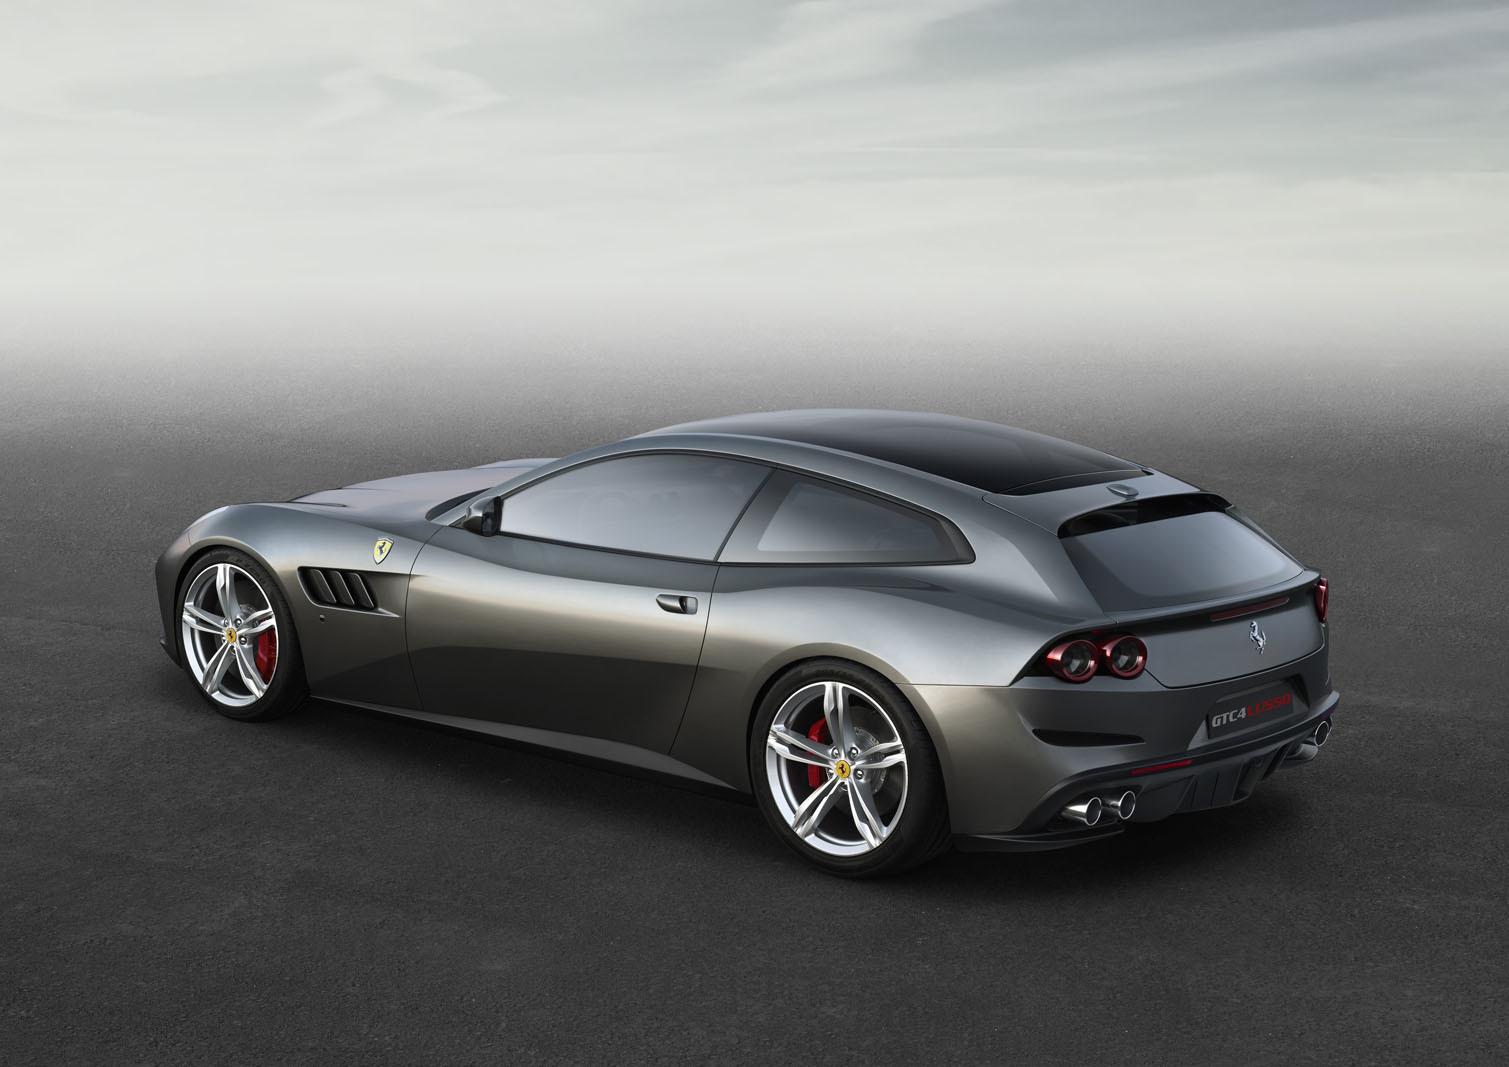 Foto de Ferrari GTC4Lusso (9/9)